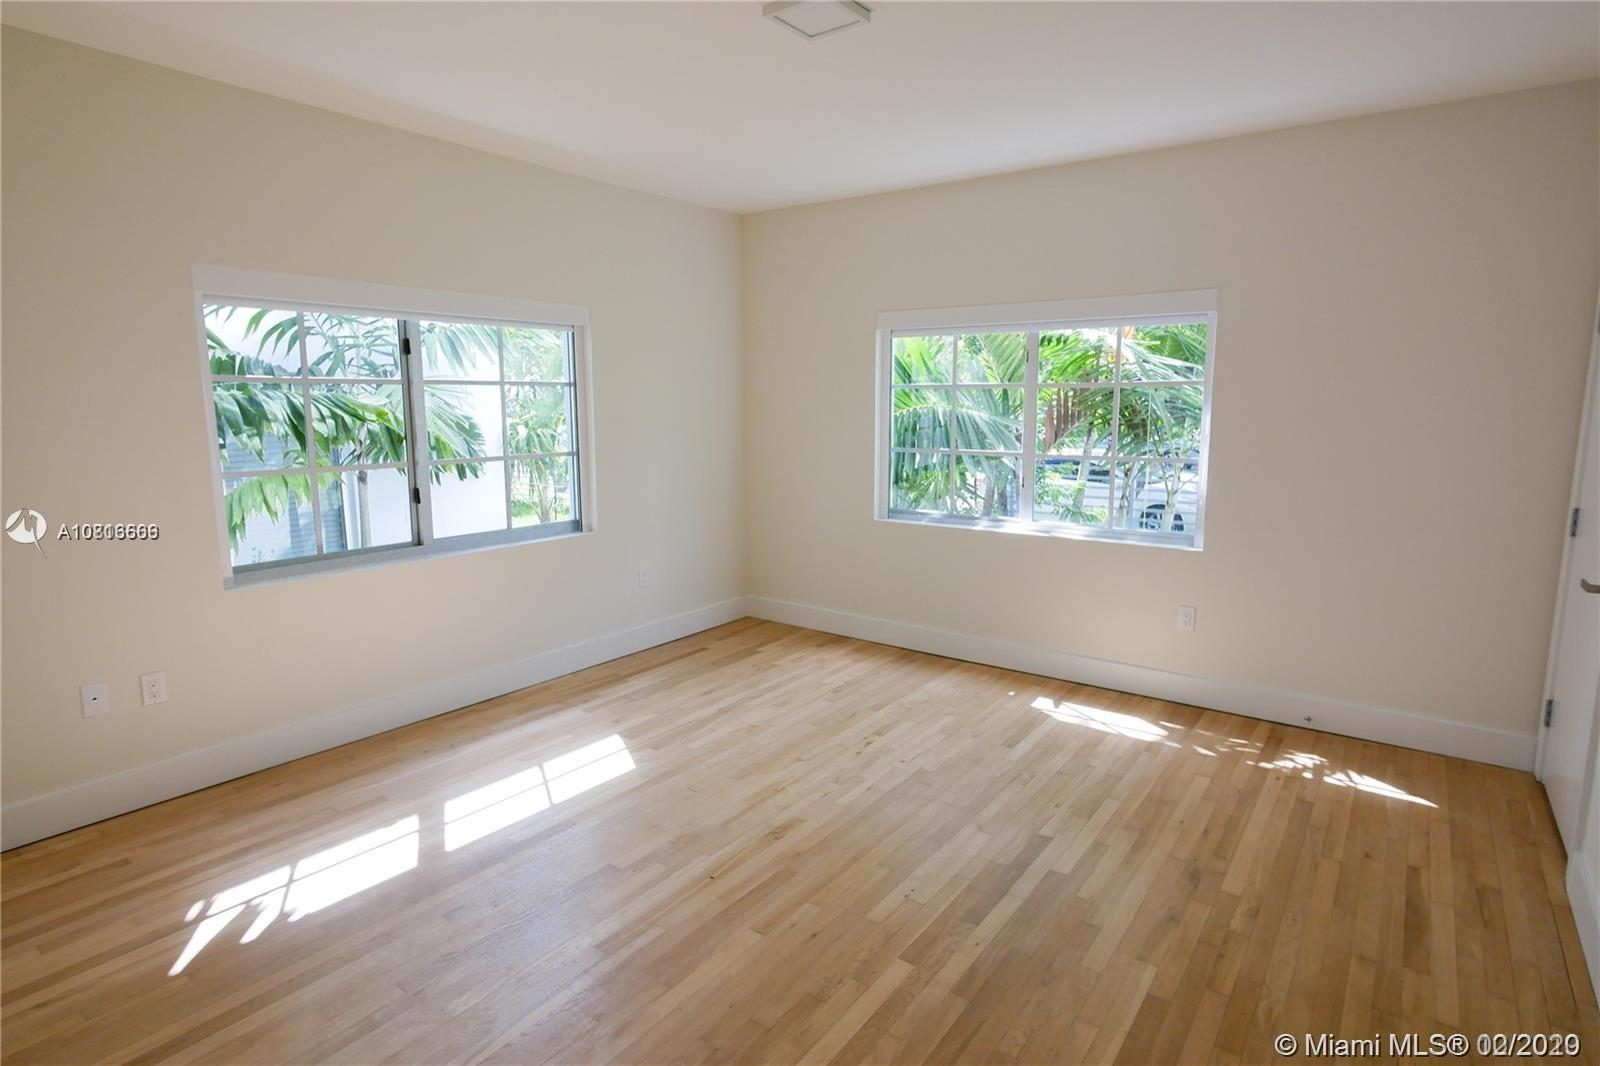 643 Jefferson Ave, 5 - Miami Beach, Florida